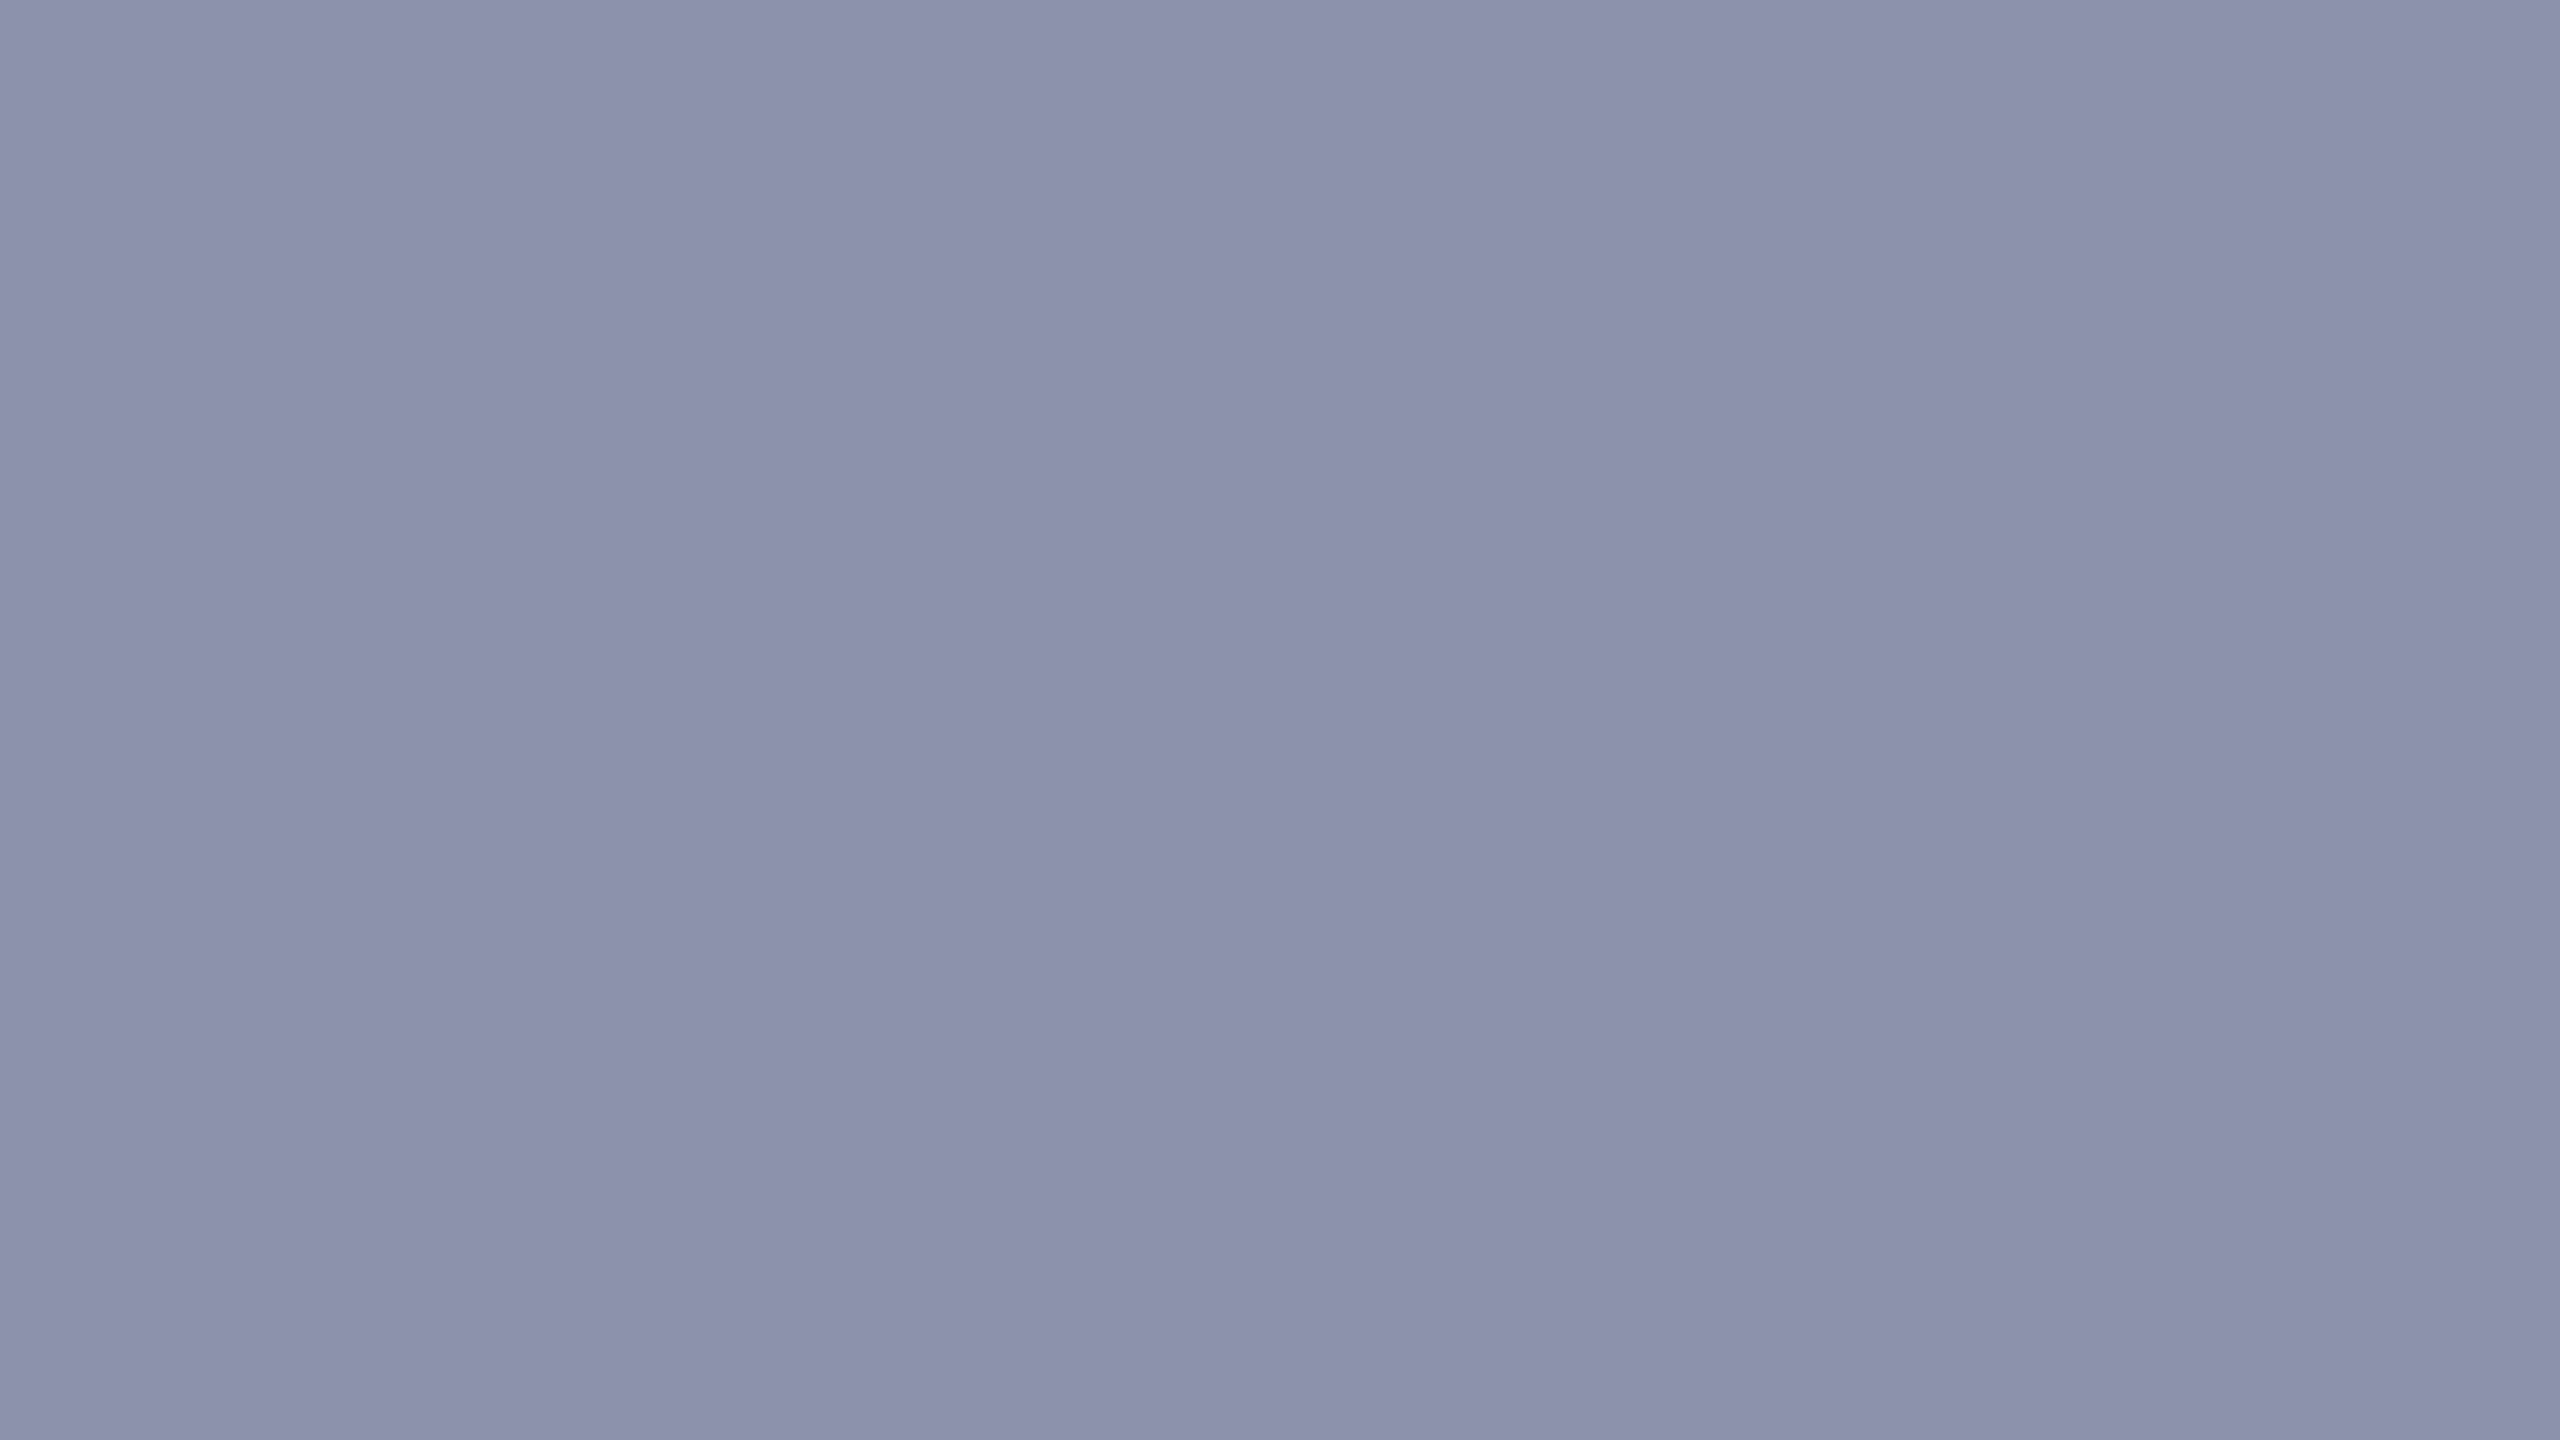 blue gray wallpaper wallpapersafari. Black Bedroom Furniture Sets. Home Design Ideas